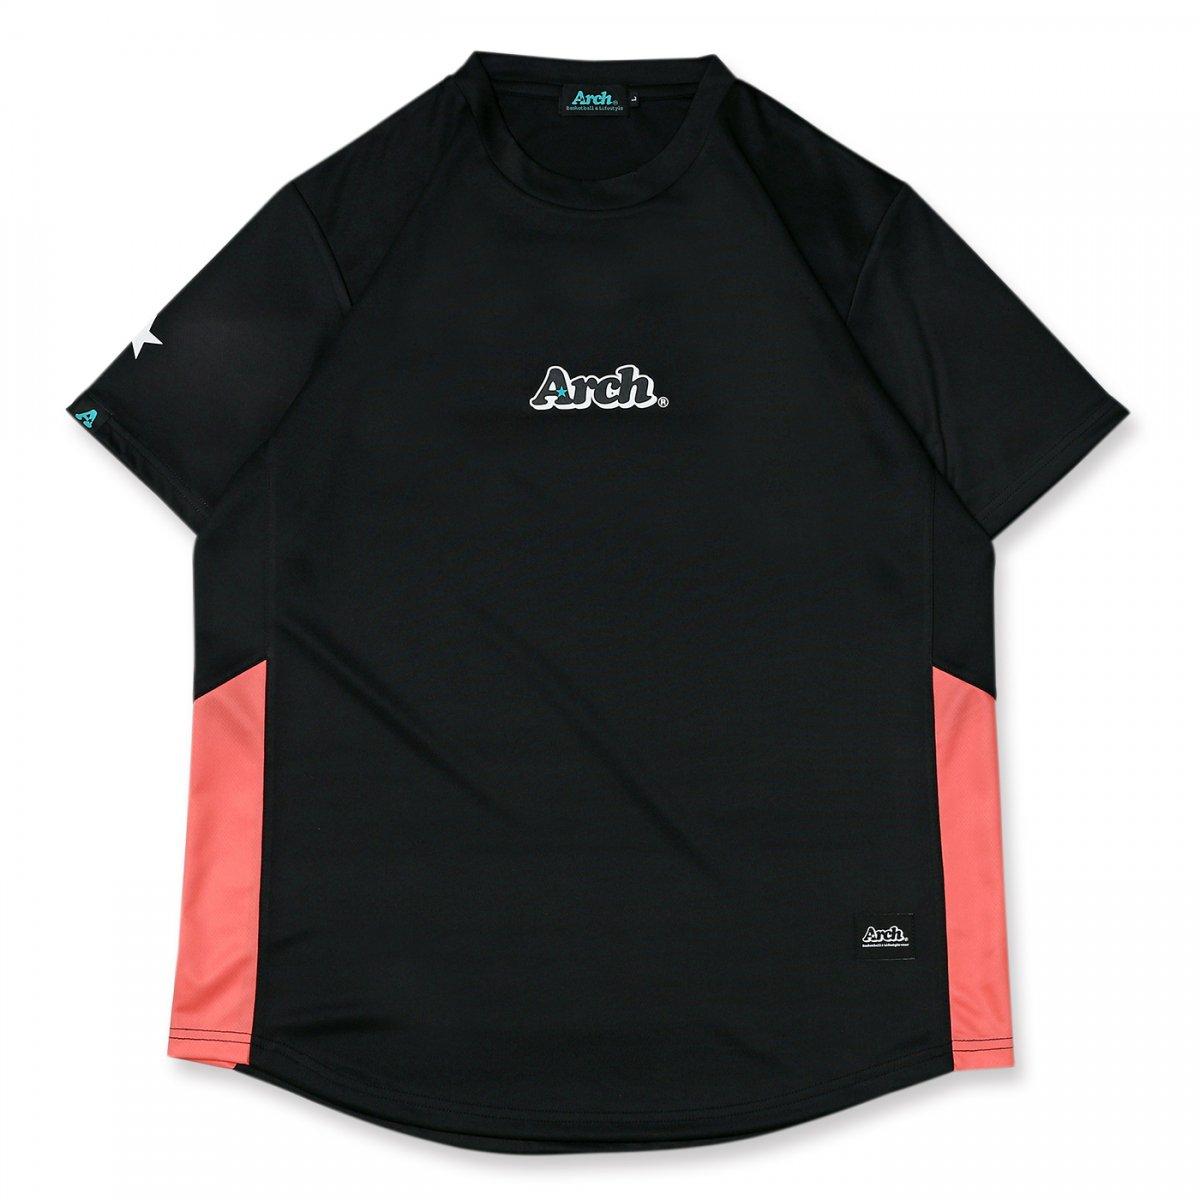 rise paneled tee [DRY]【black/pink】